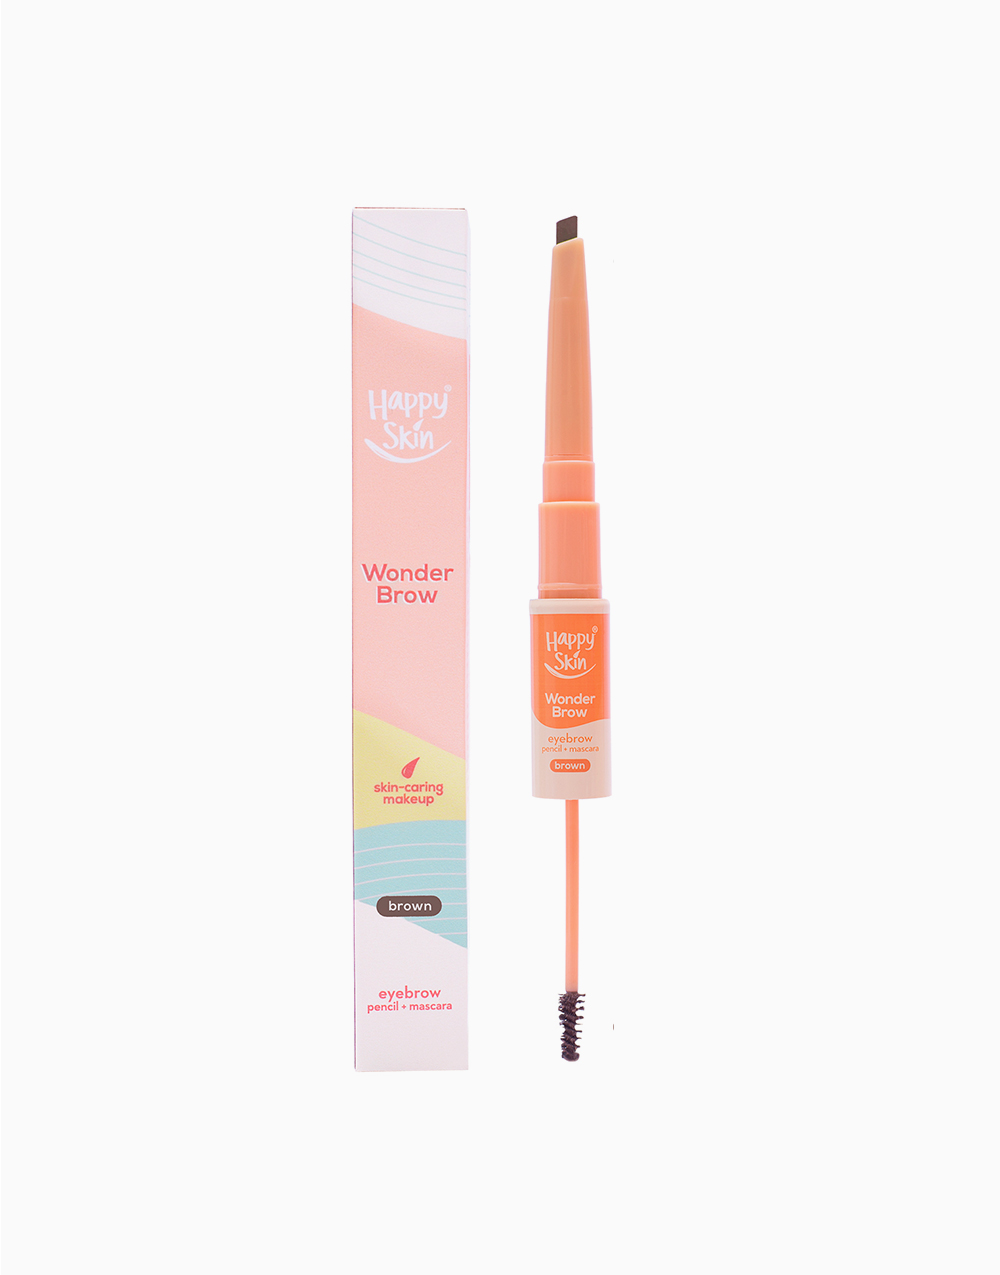 Wonder Brow Eyebrow Pencil + Mascara by Happy Skin | Brown